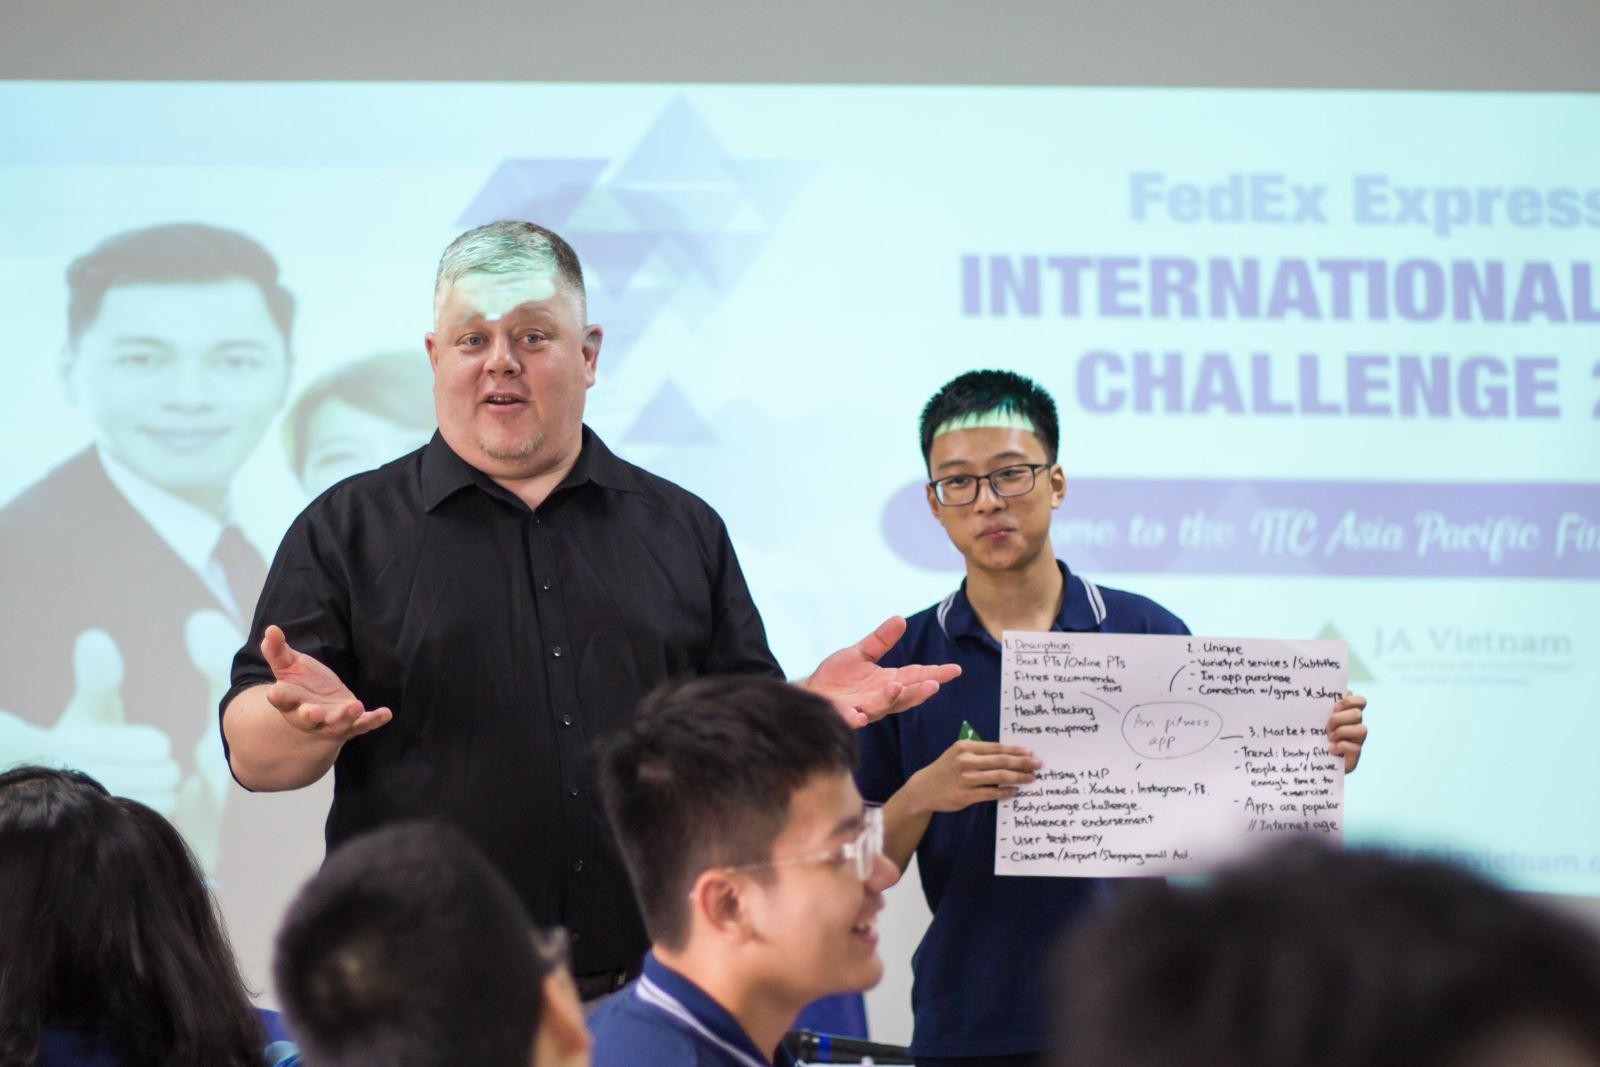 Bring International Trade into the classroom